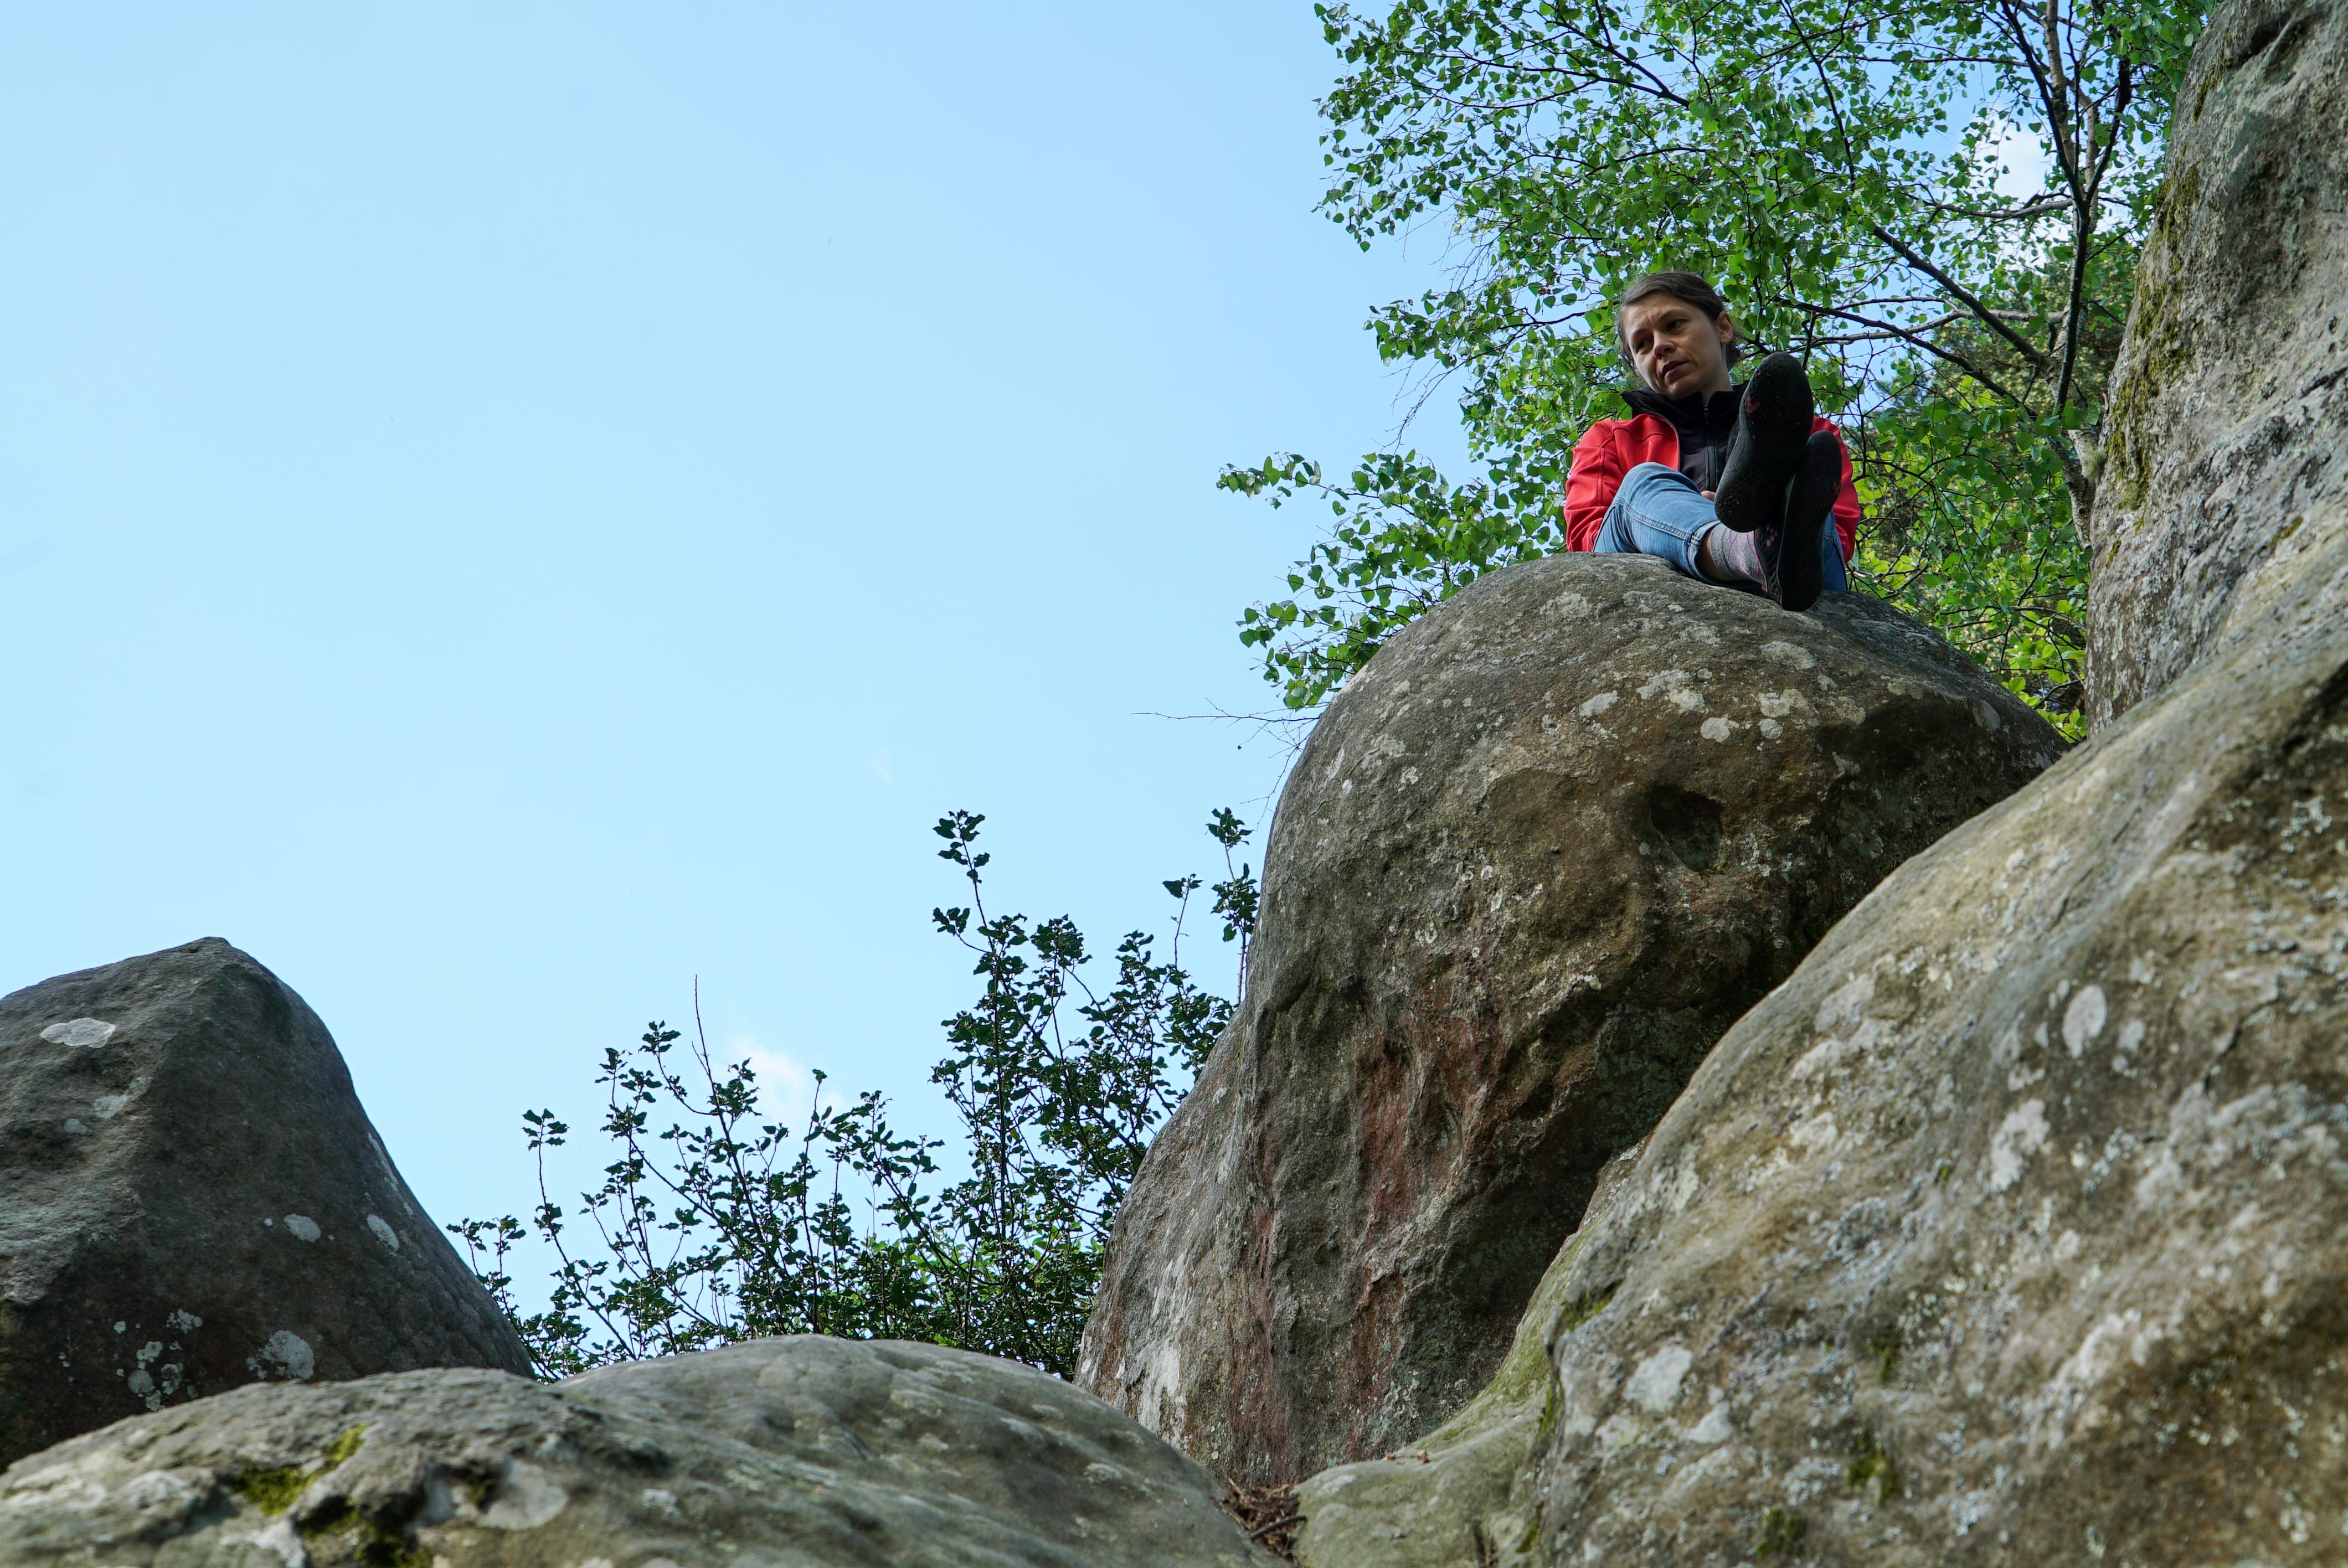 fontainbleau climbing 2016 mike brindley-127